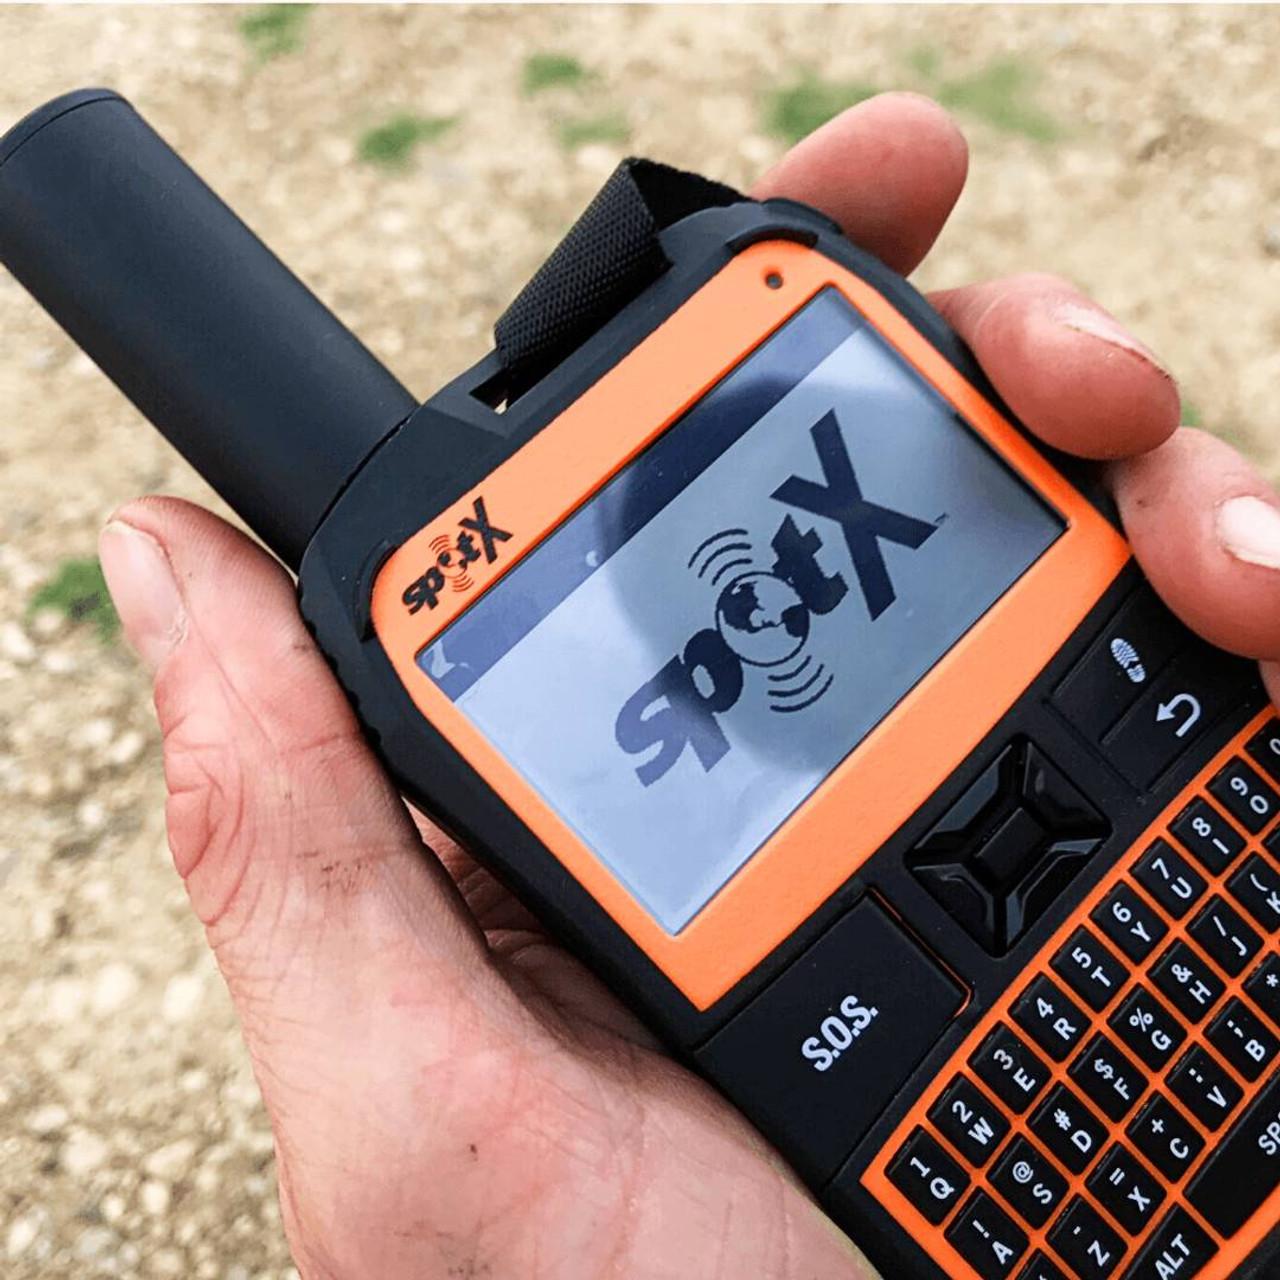 SPOT X 2-Way Satellite Messenger with Bluetooth